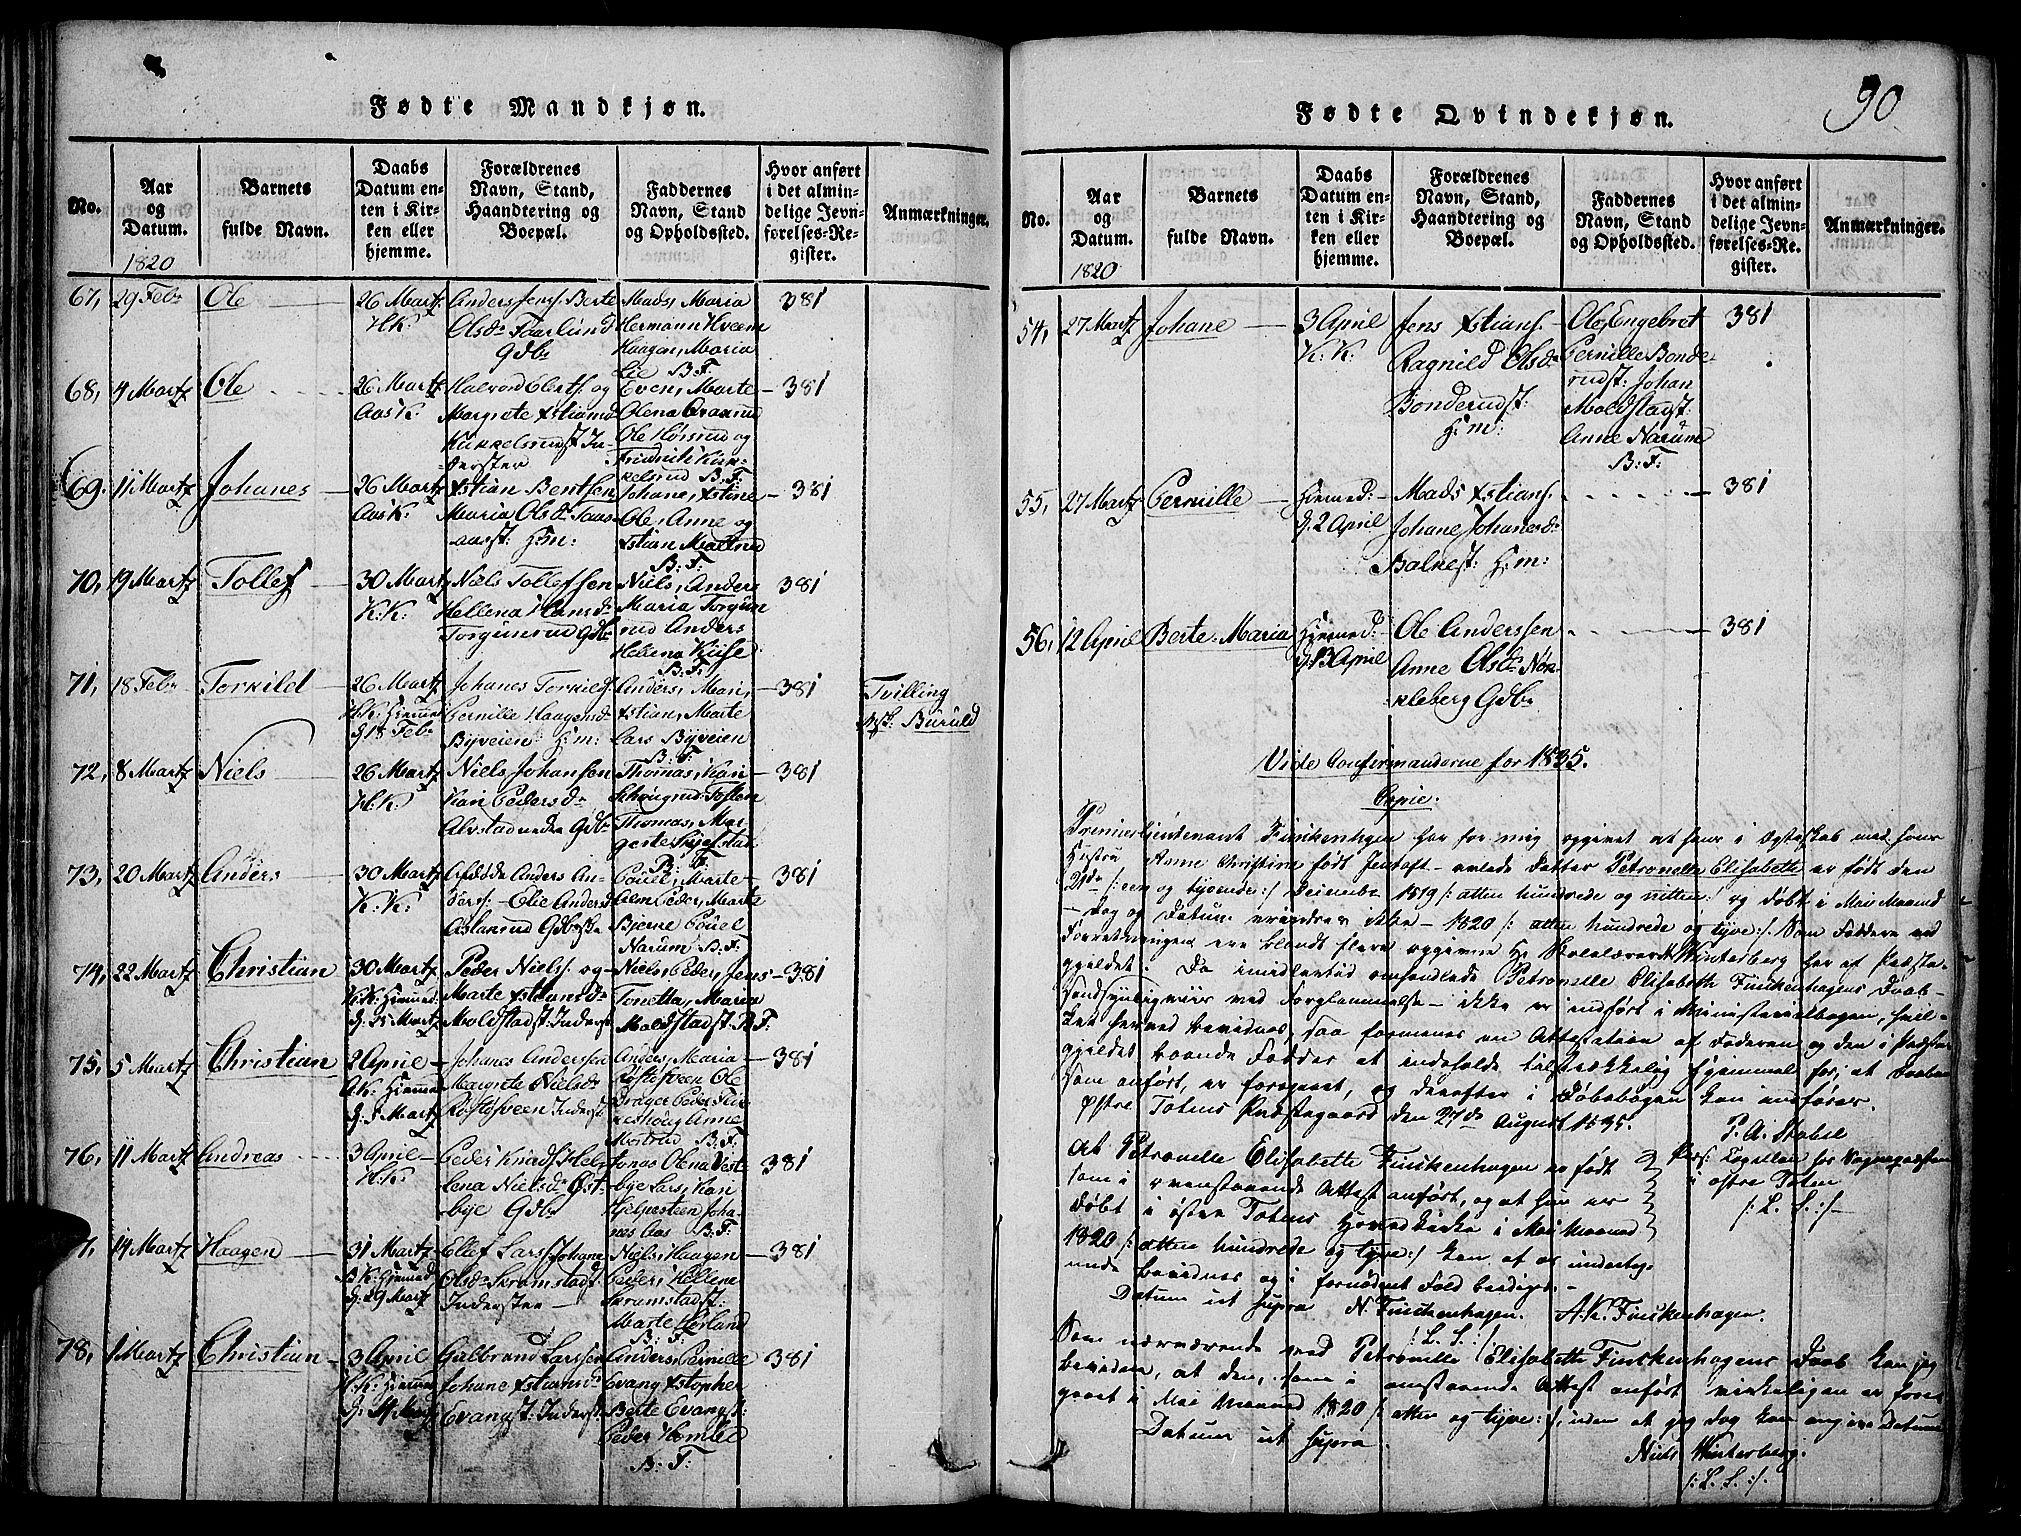 SAH, Toten prestekontor, Ministerialbok nr. 9, 1814-1820, s. 90